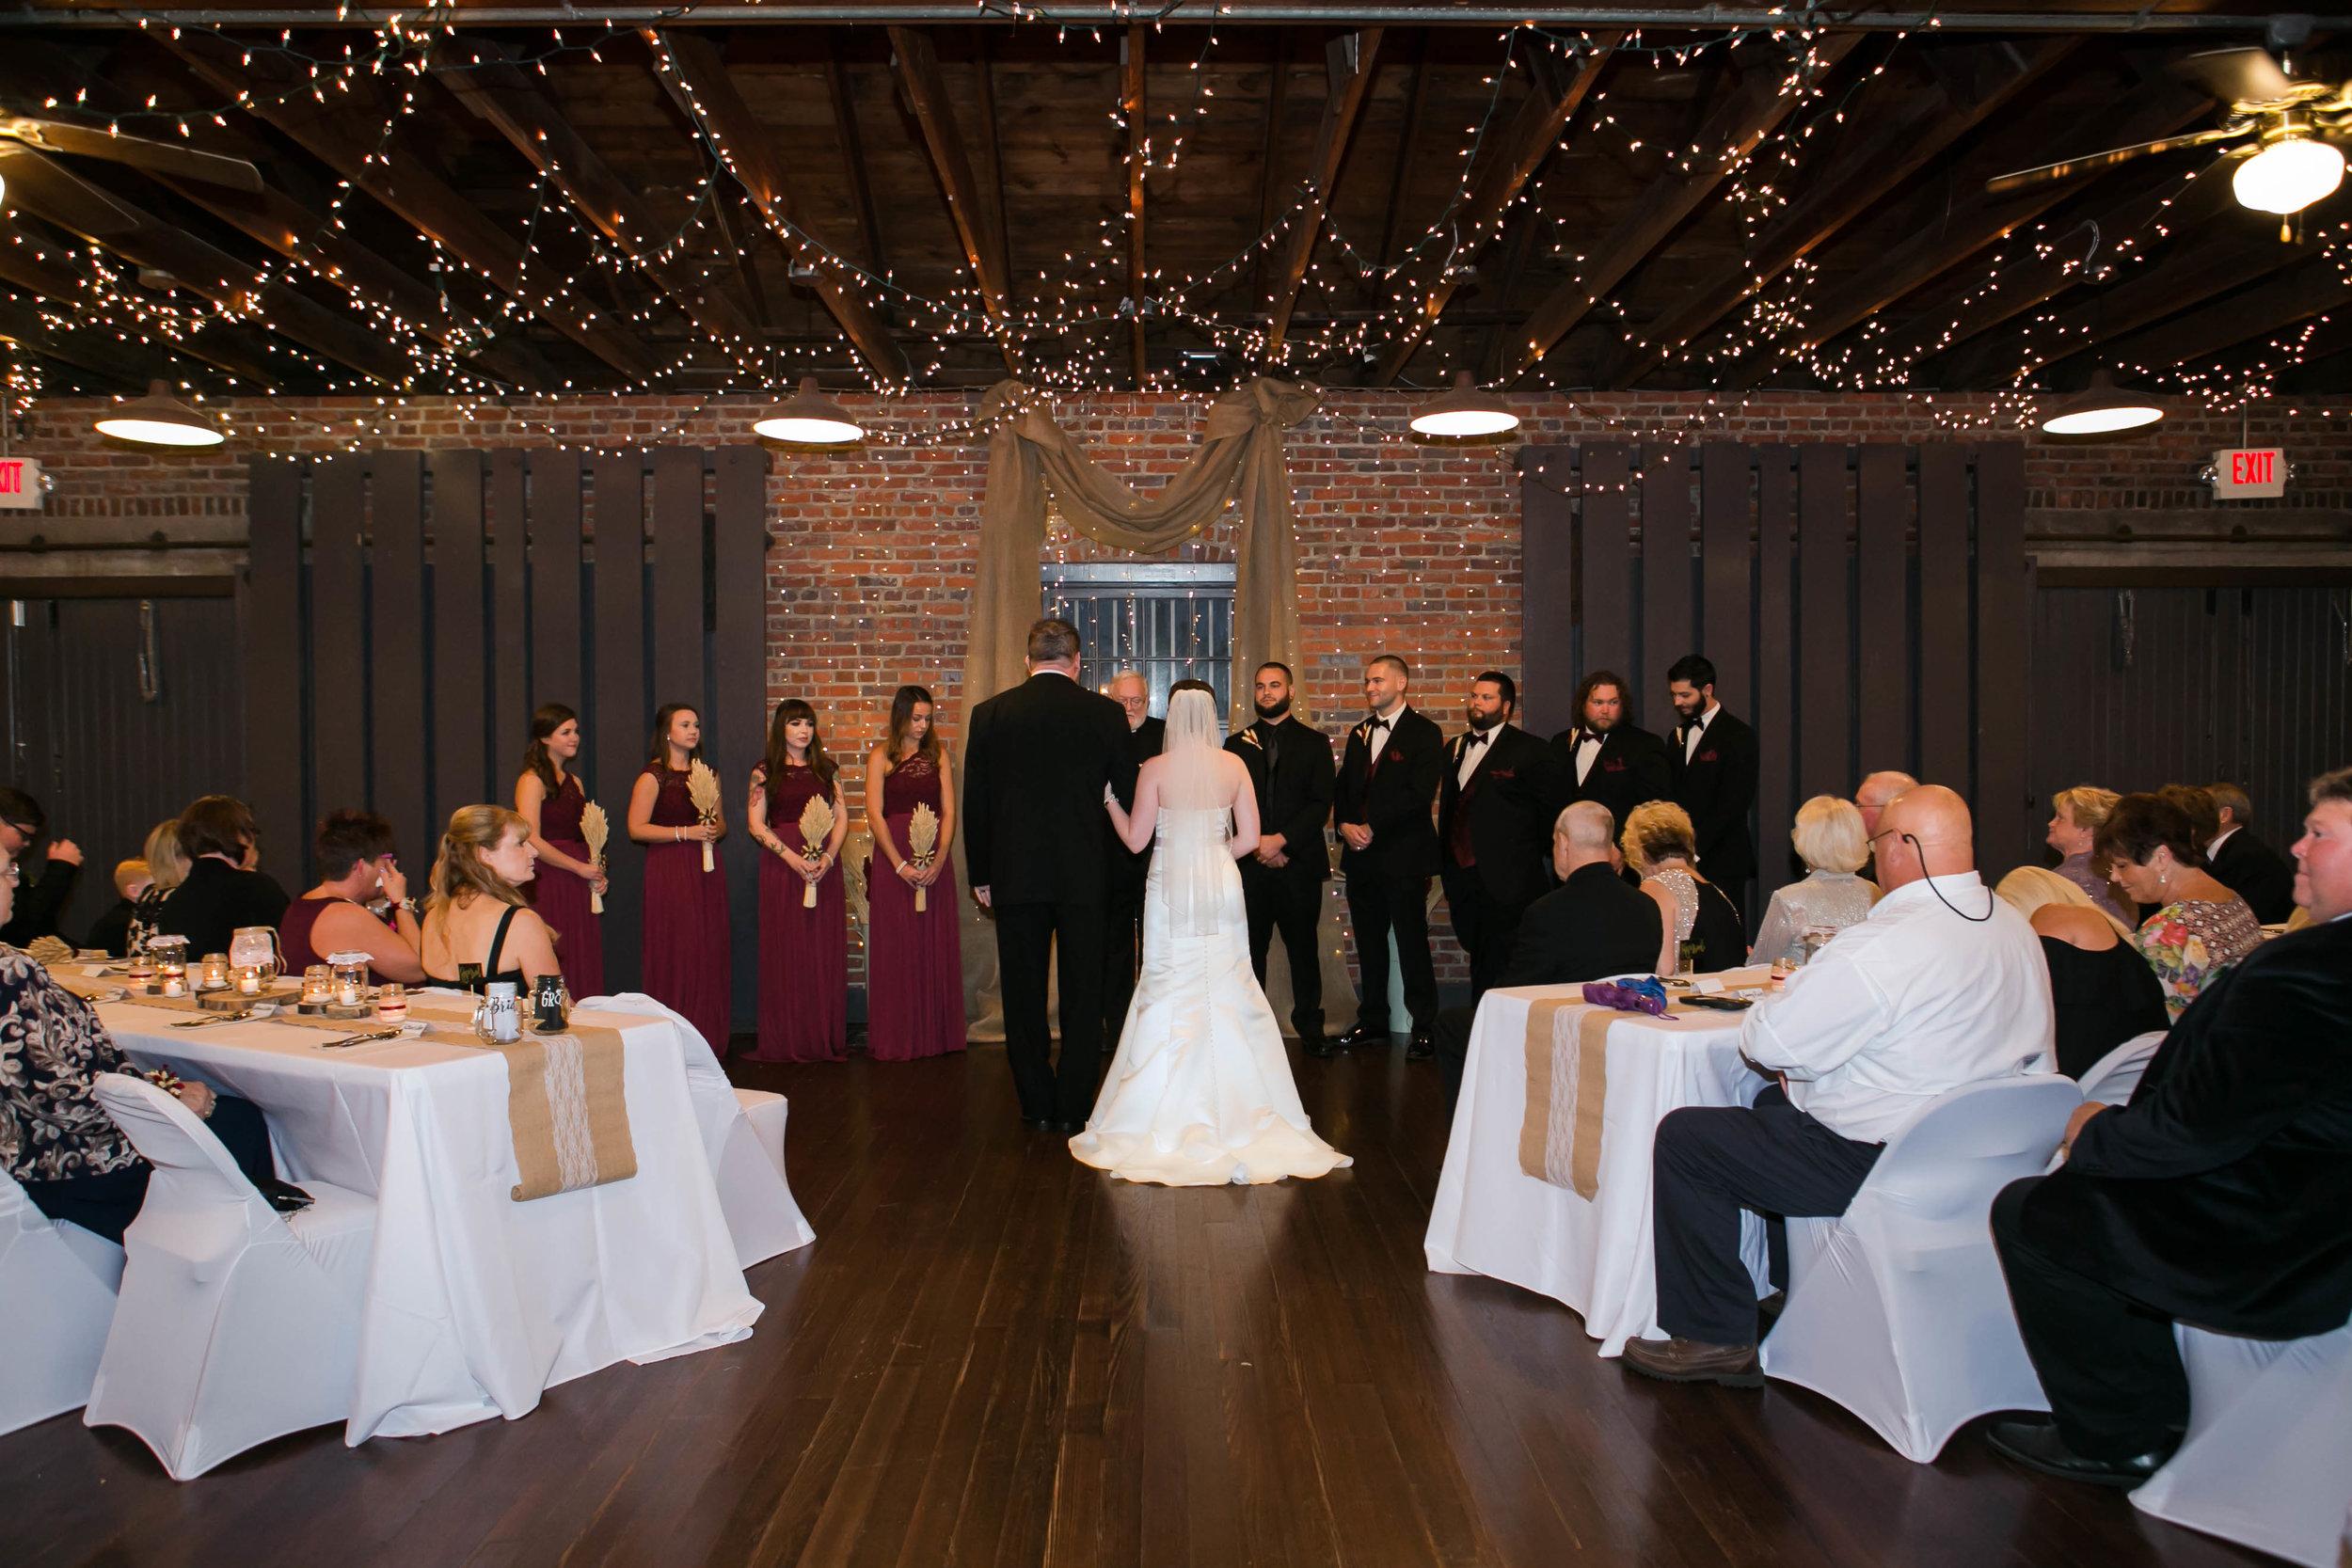 Darla + Phillip: Industrial Chic Wedding at Myrtle Beach Train Depot | Palmetto State Weddings